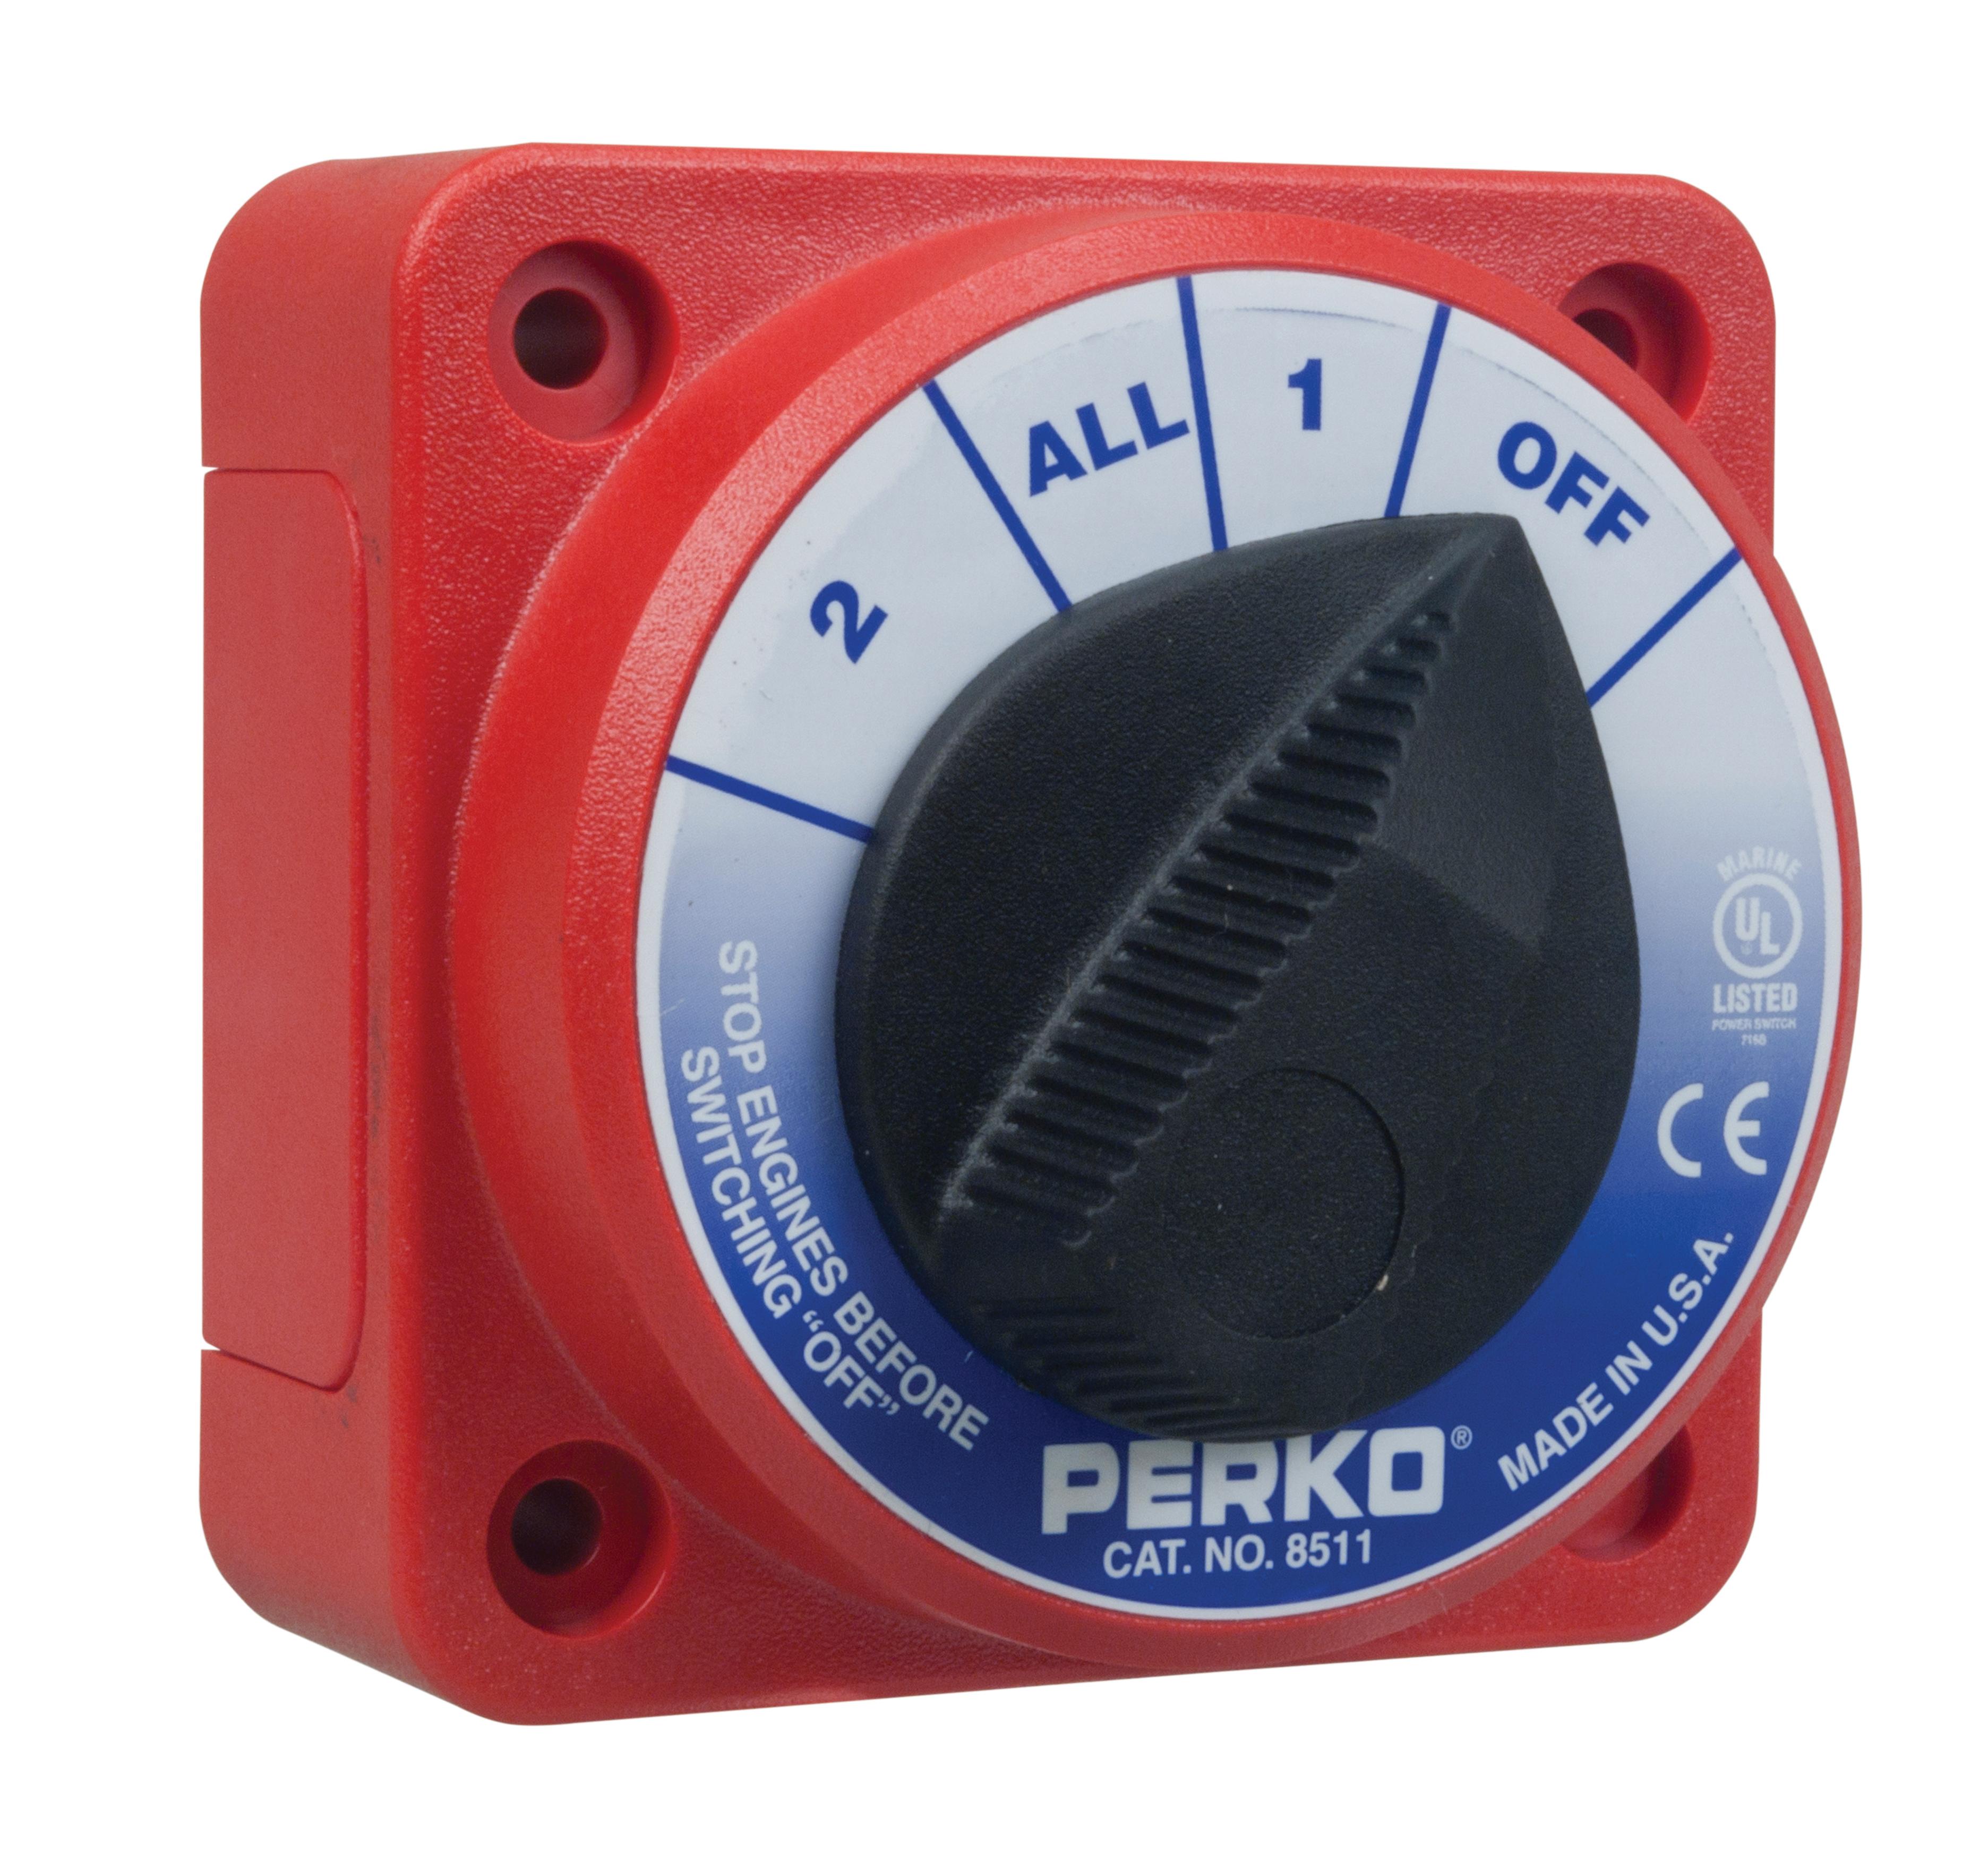 perko battery switch to trolling motor wiring diagram two